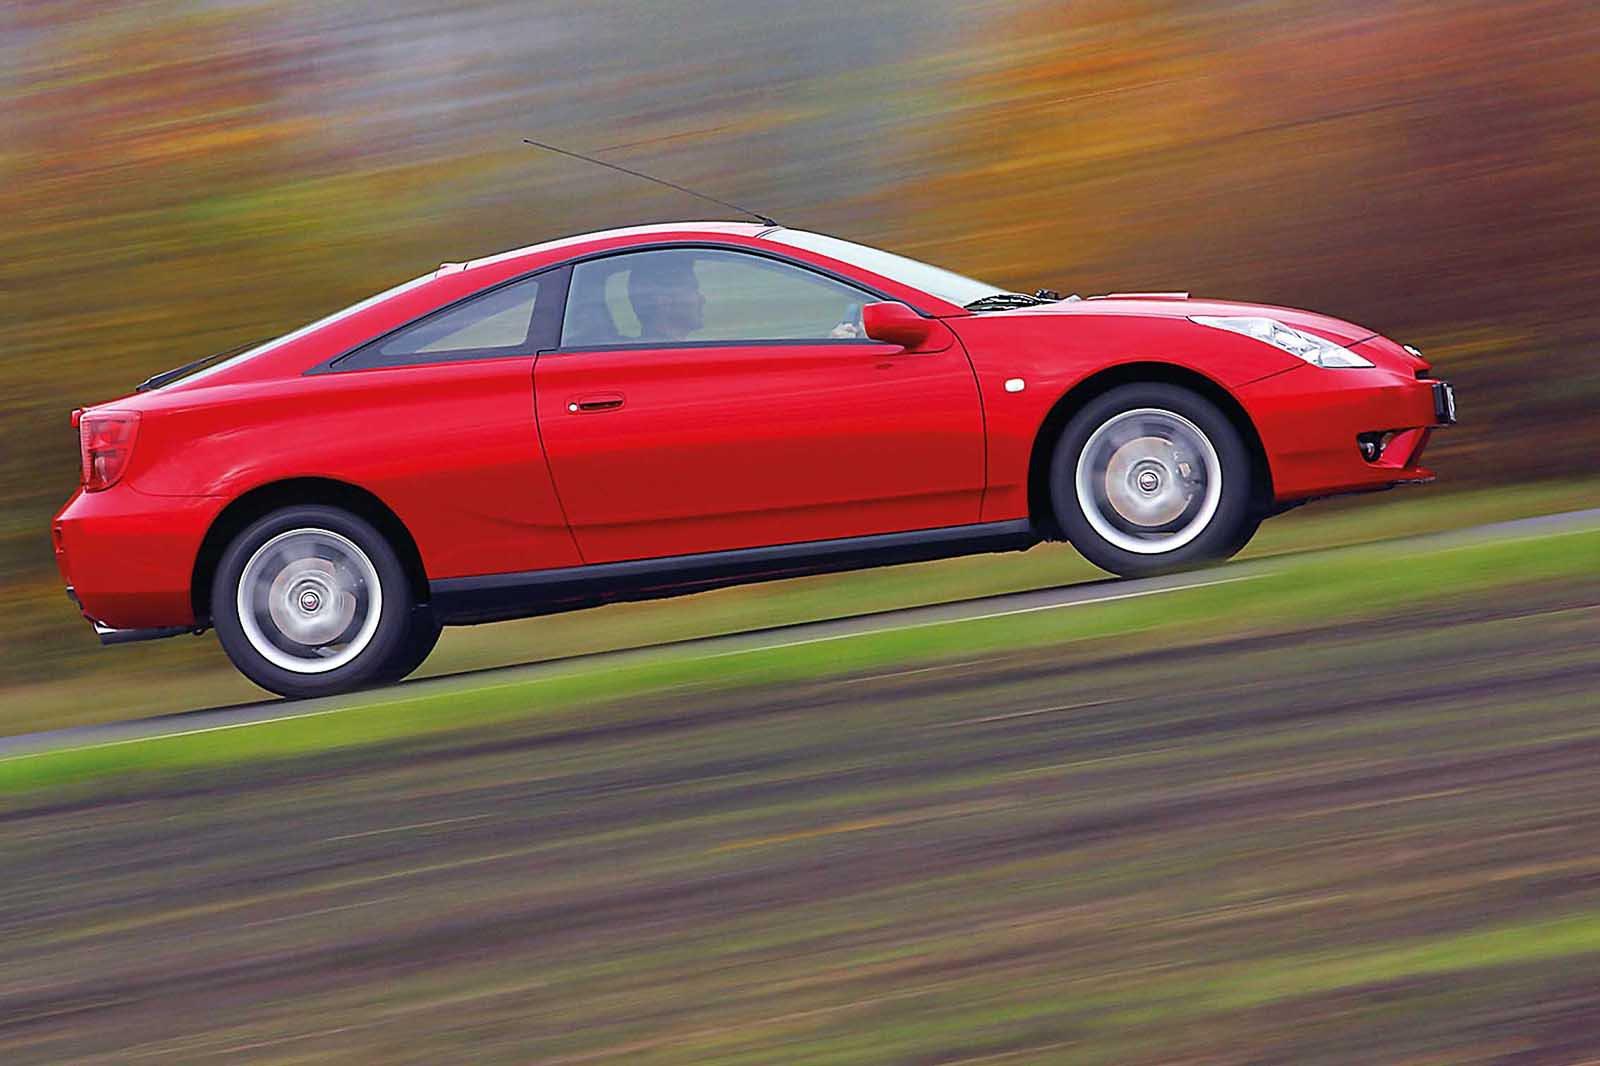 Toyota Celica side shot